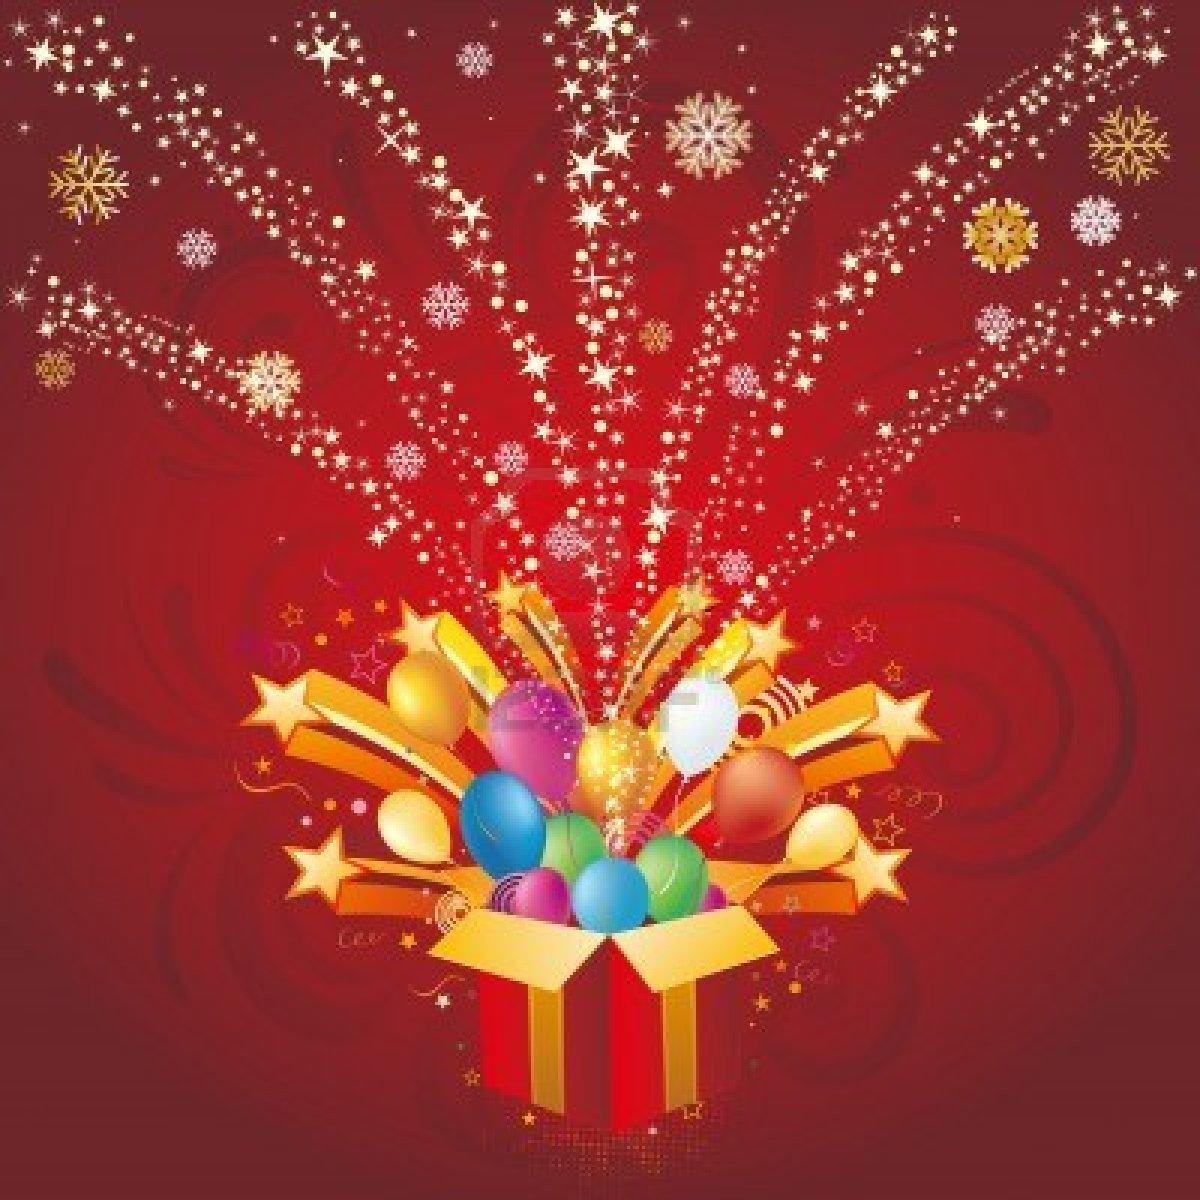 Brc Holiday Celebration Photos 2015: 8174096-gift-box-and-star-christmas-celebration-background